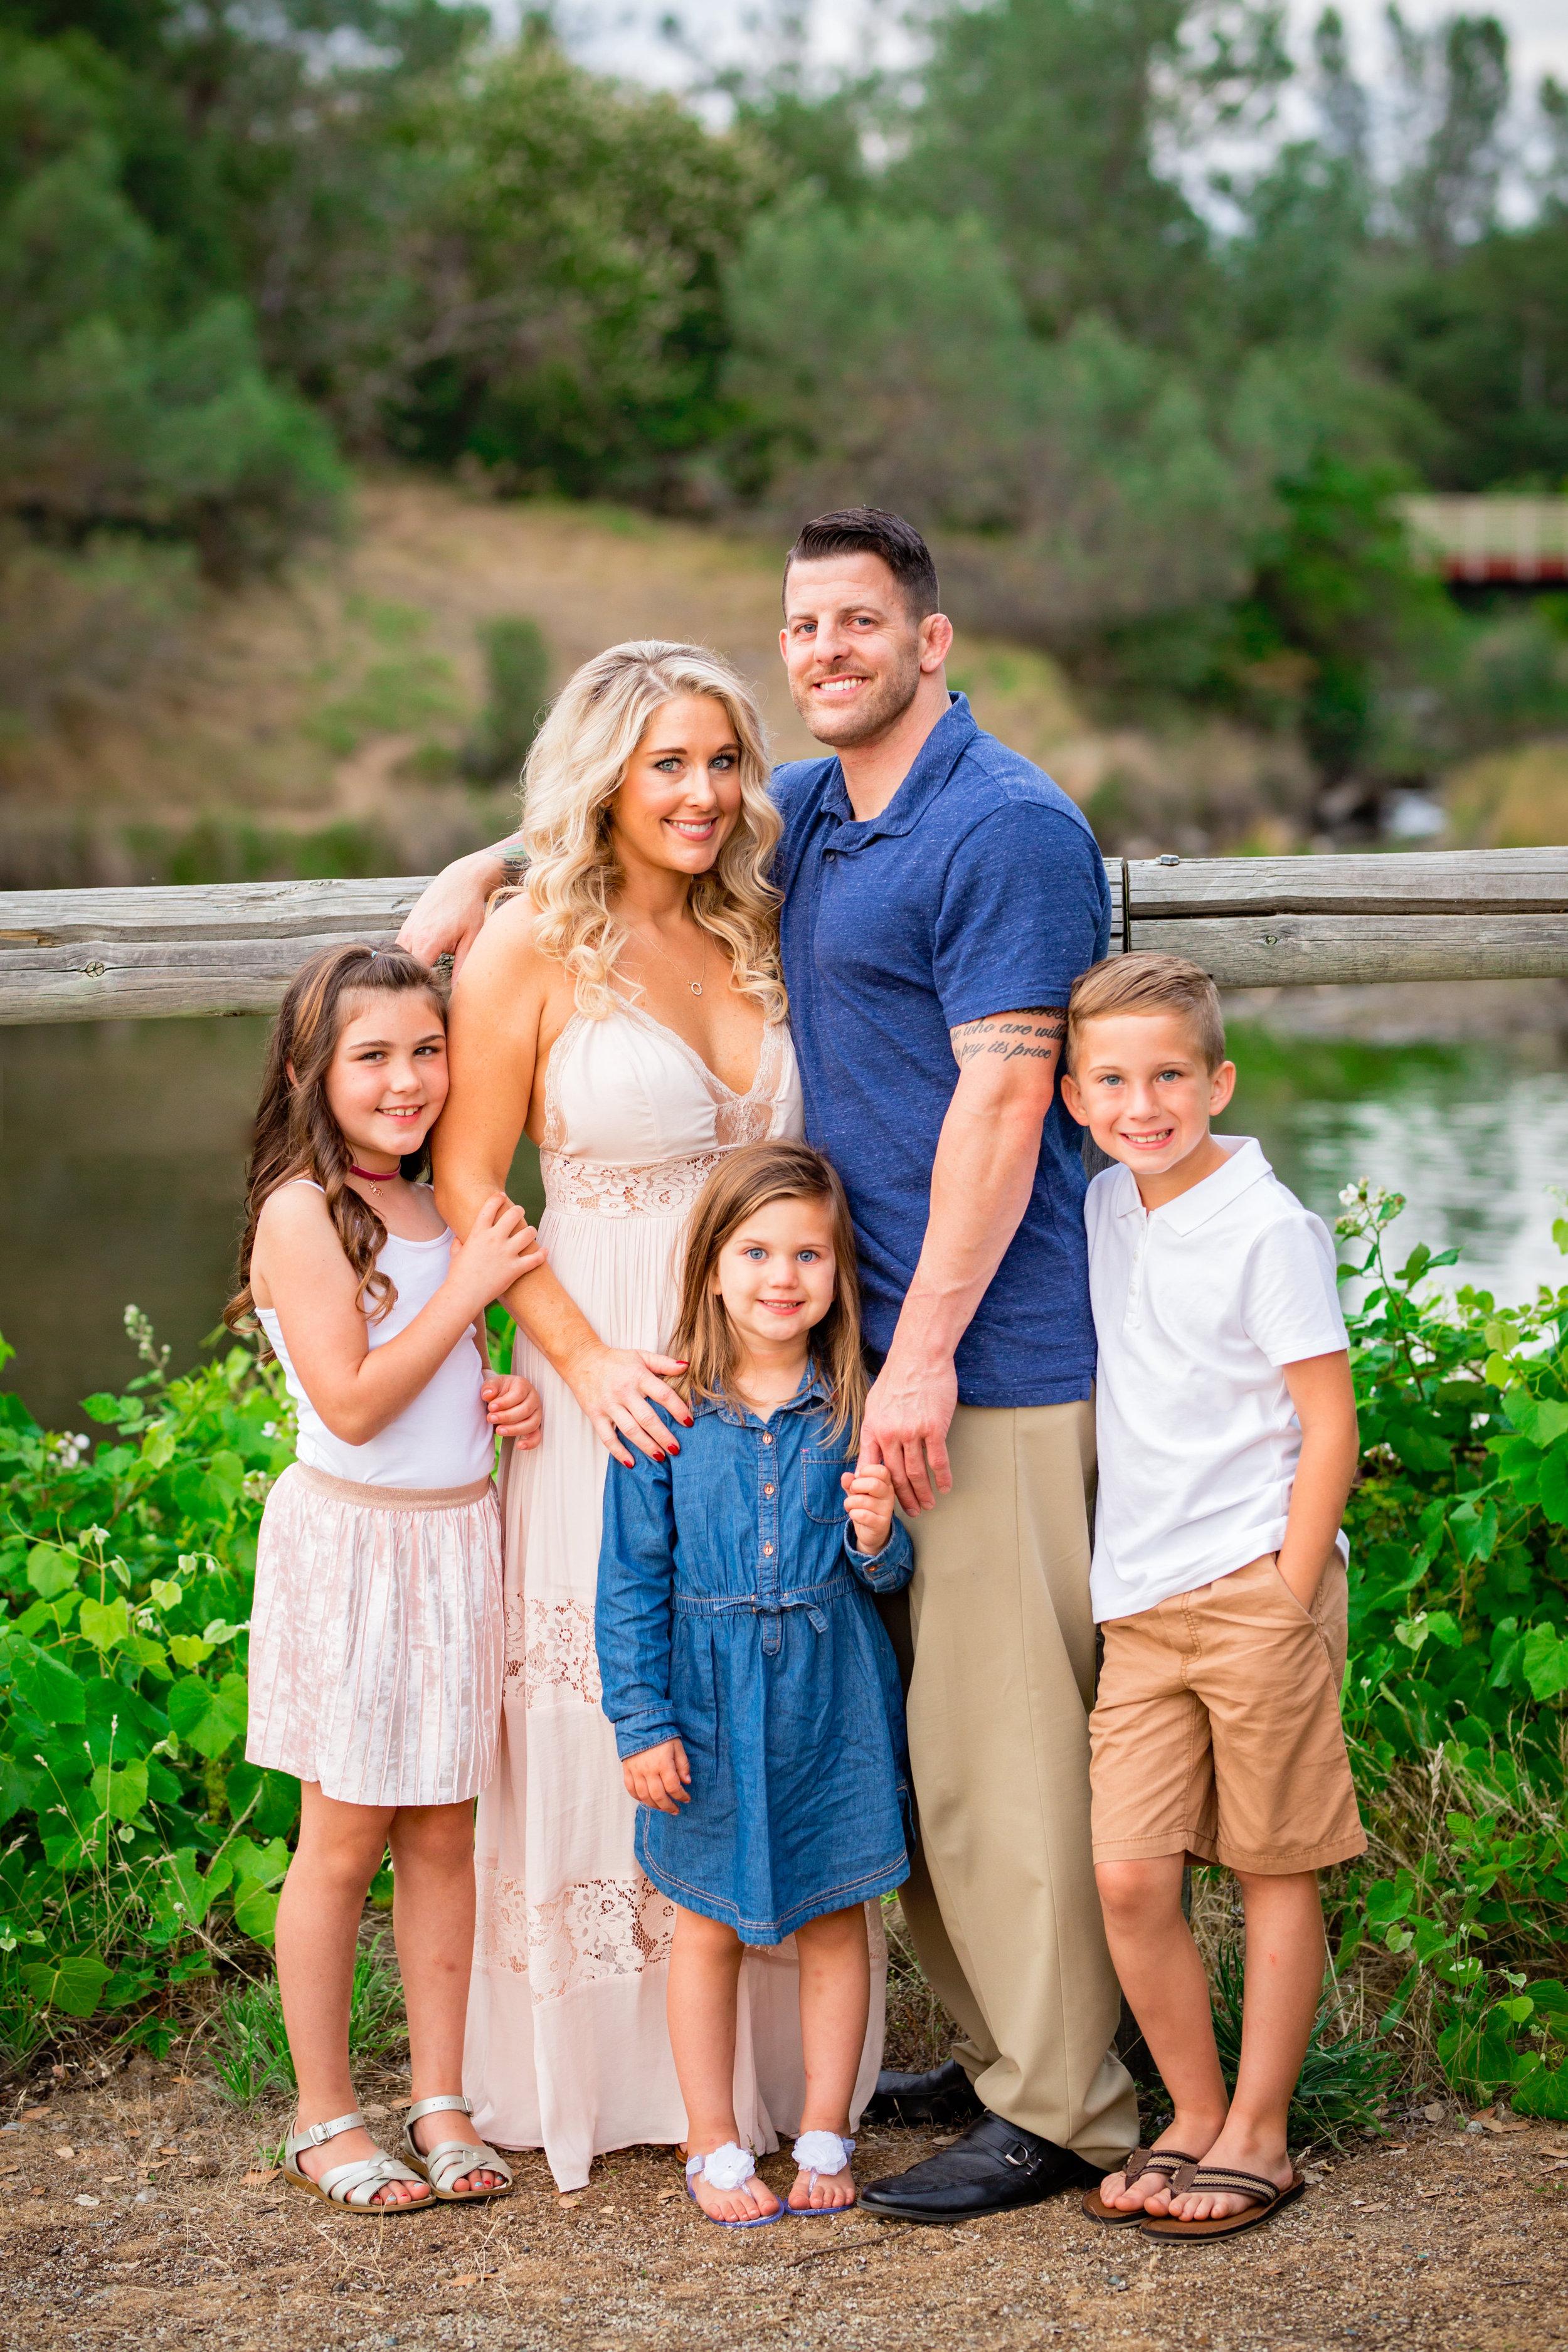 Stacie & Justin - Folsom Family Session - Sacramento Wedding Photographer - Ashley Teasley Photography (1 of 2).jpg